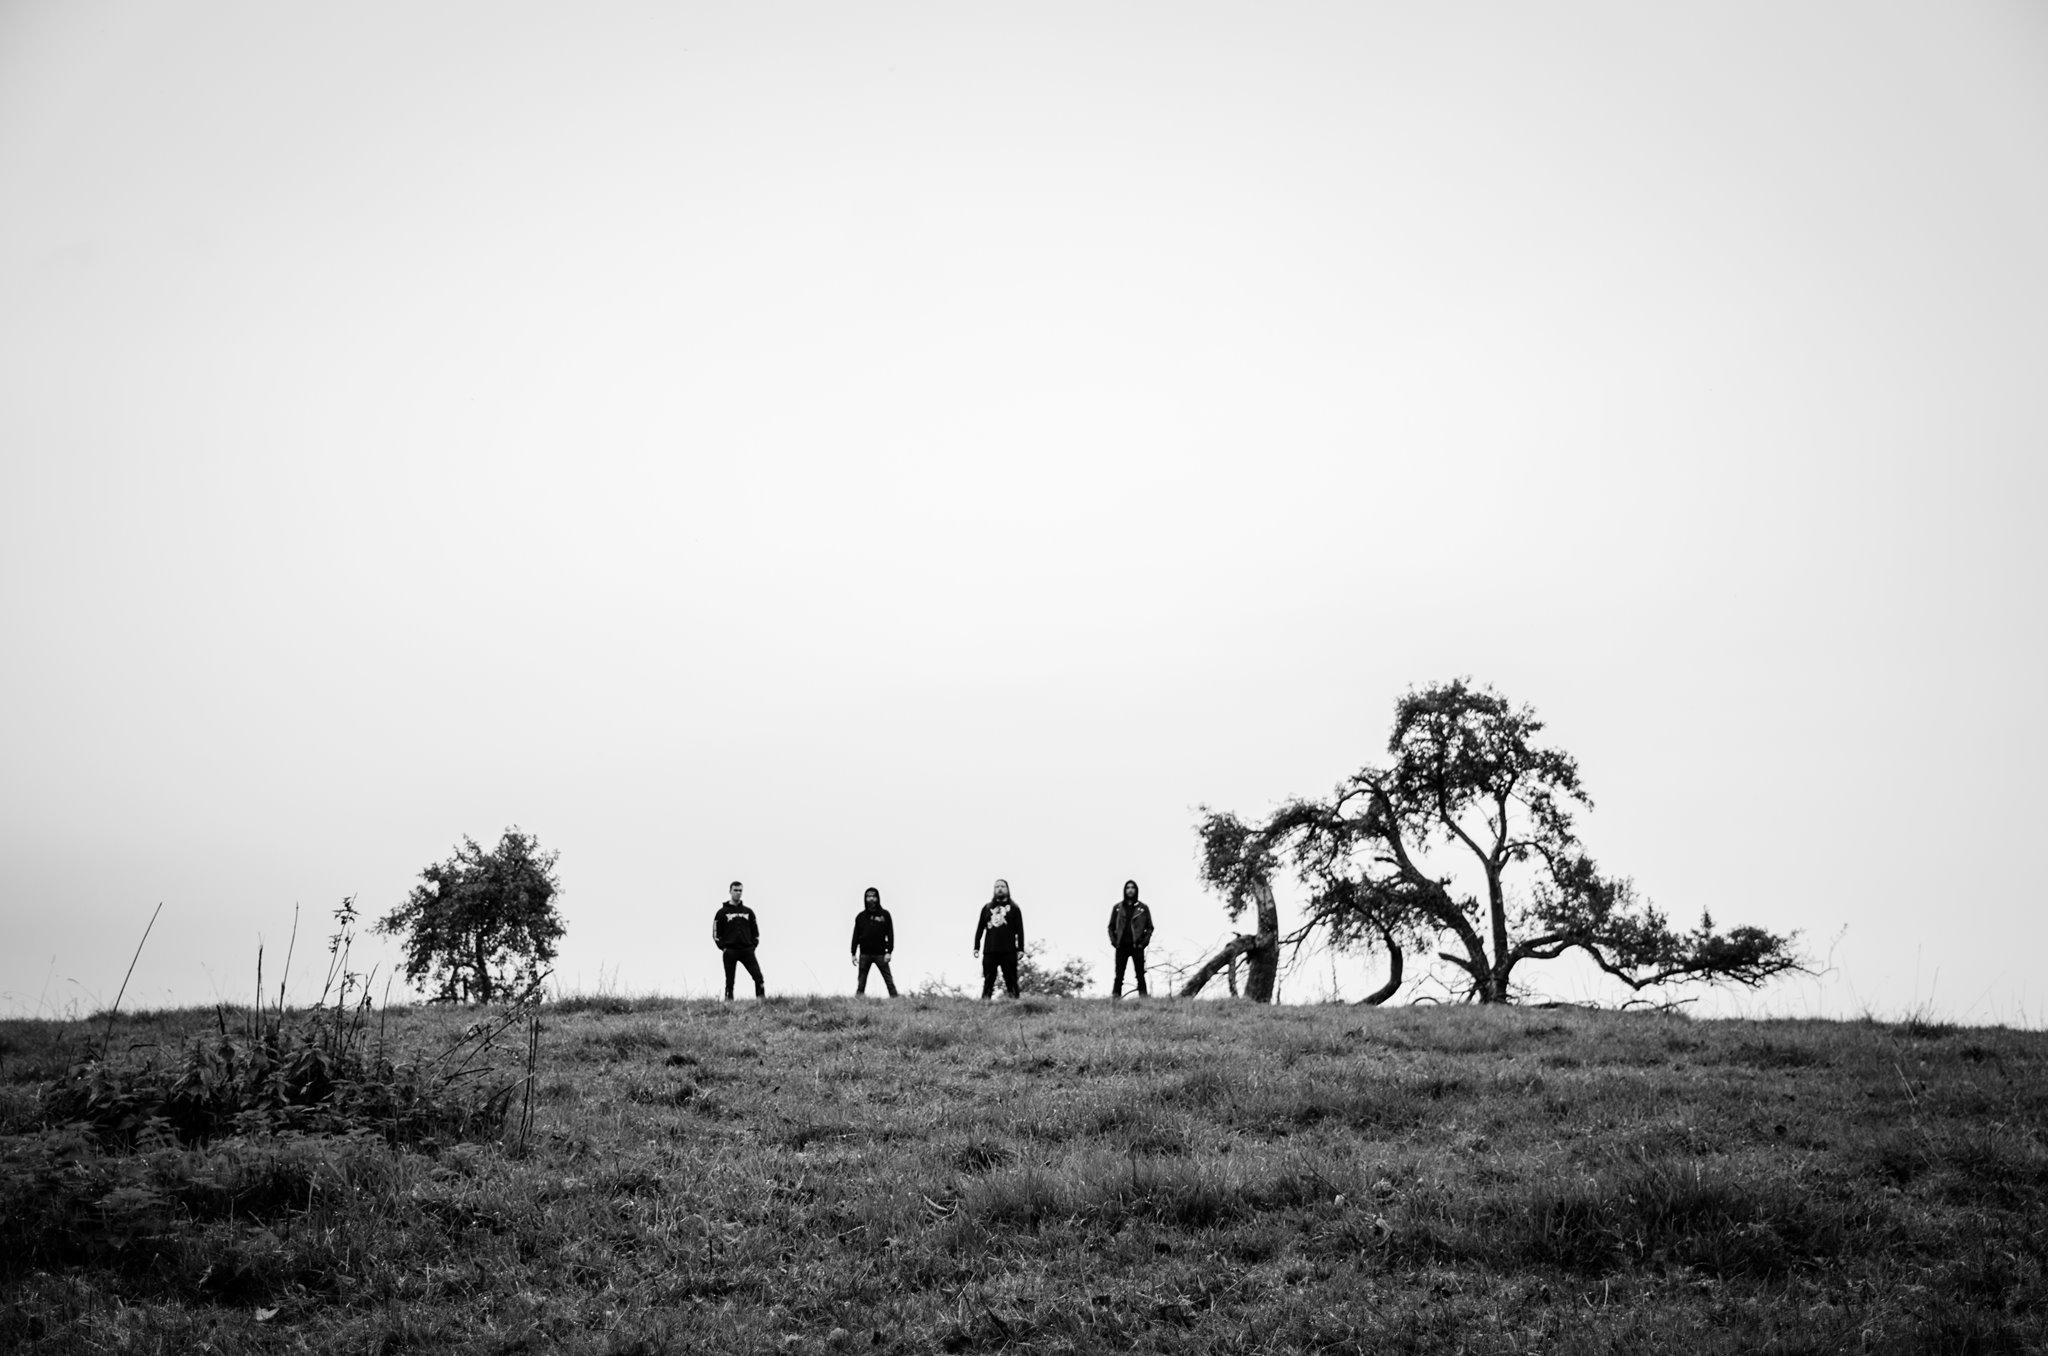 Review de Between Shades and Shadows, álbum debut de nether